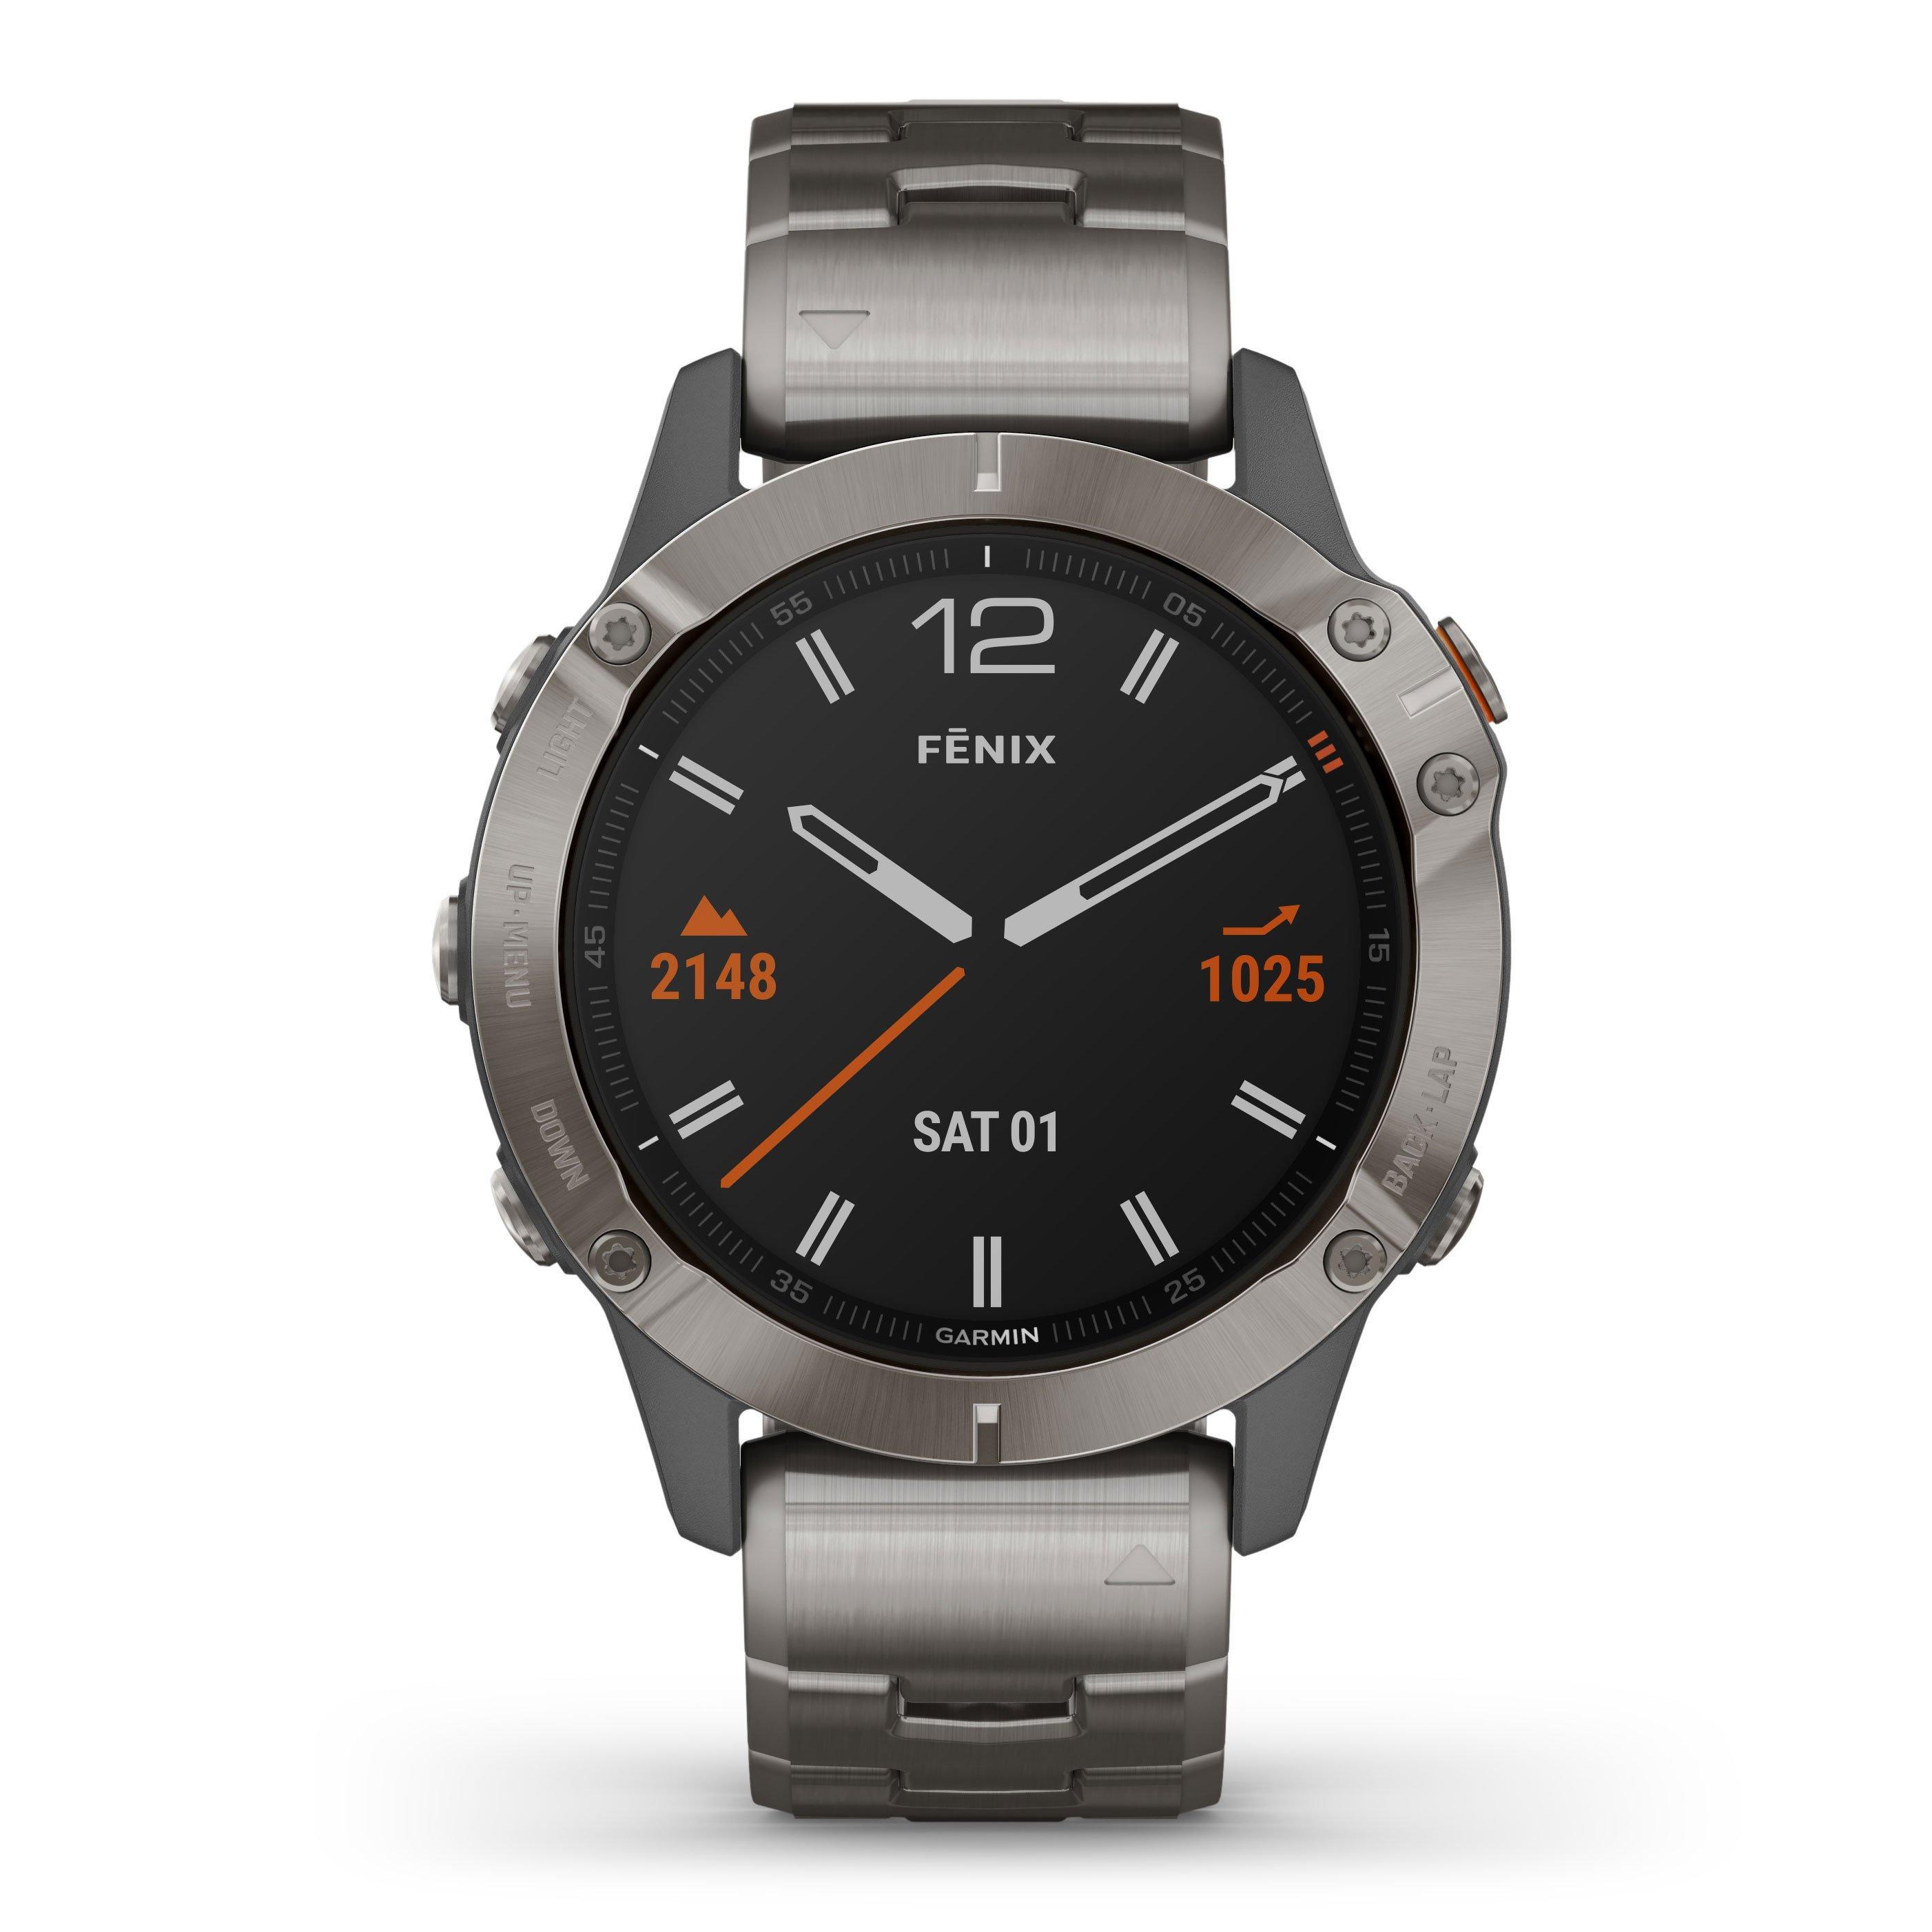 Garmin Fenix 6 Sapphire Edition Watch